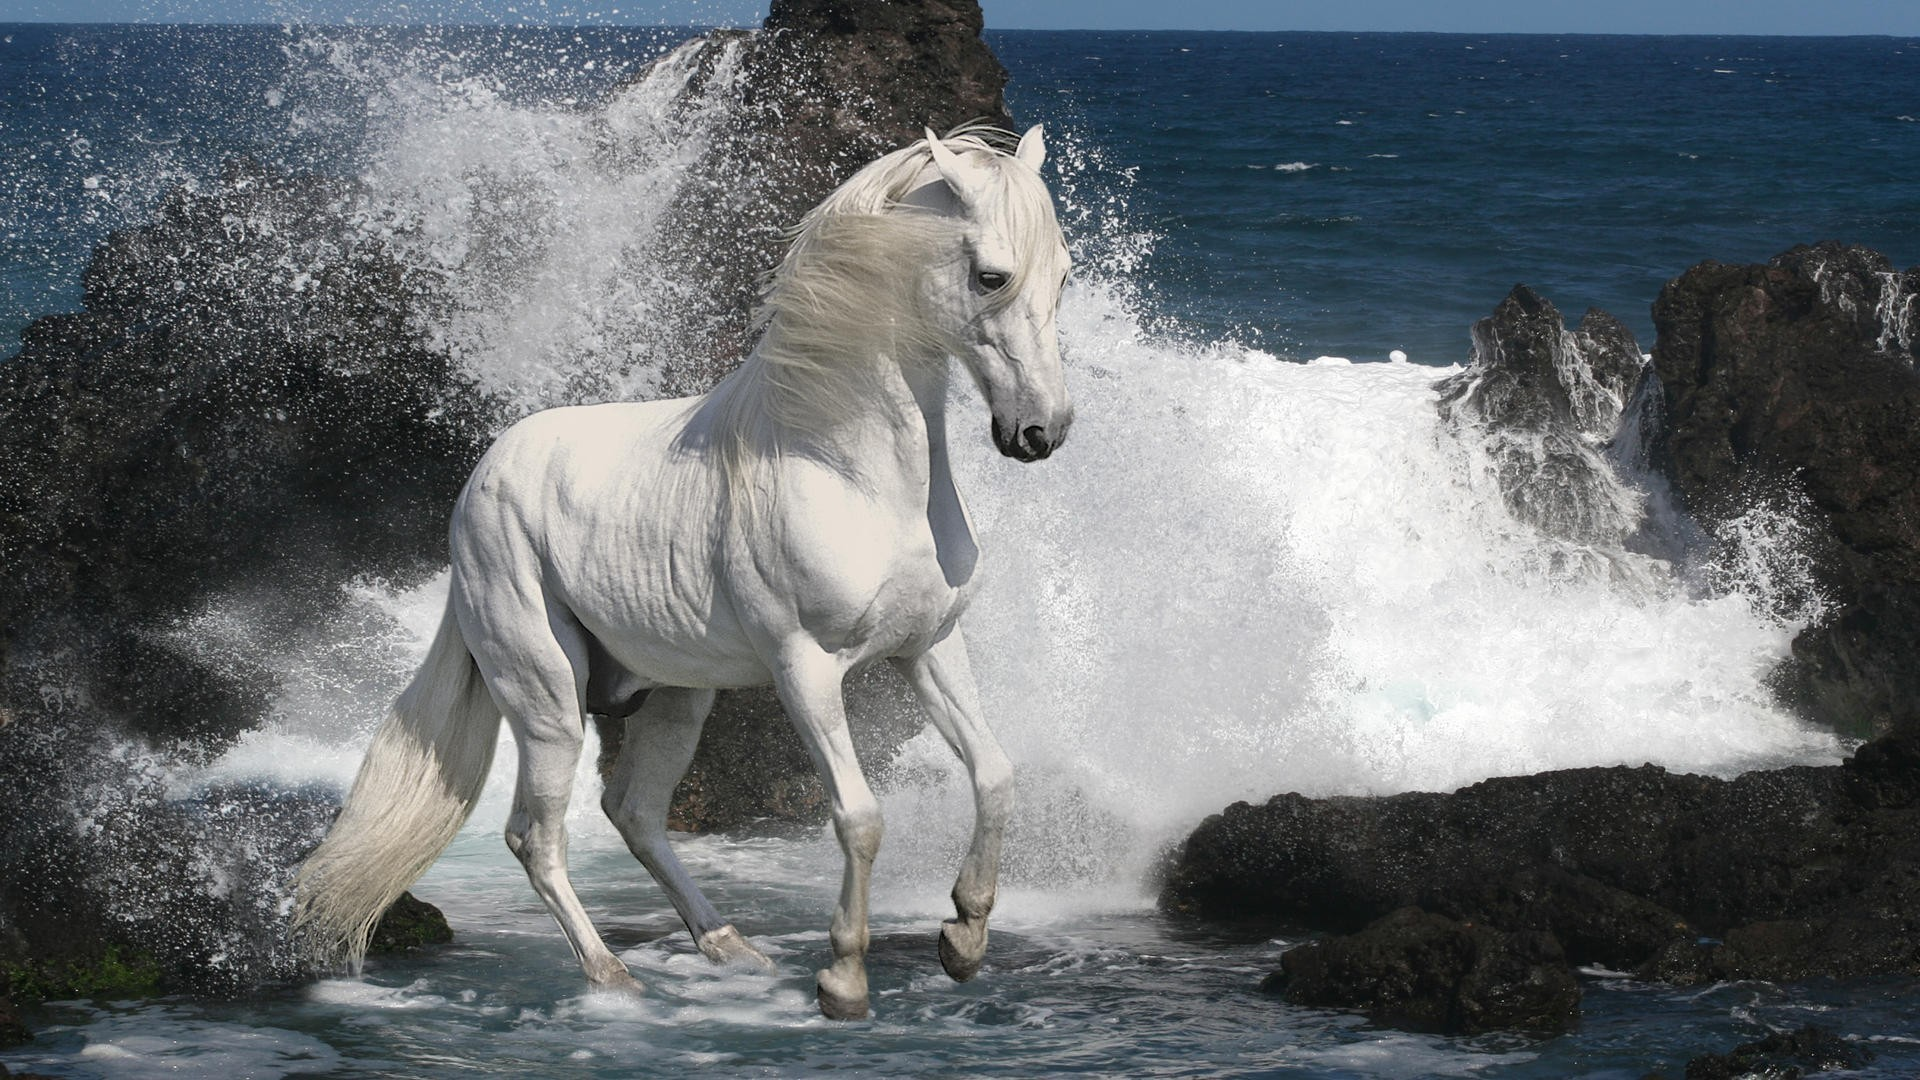 Res: 1920x1080, Southern animals horses sea wallpaper